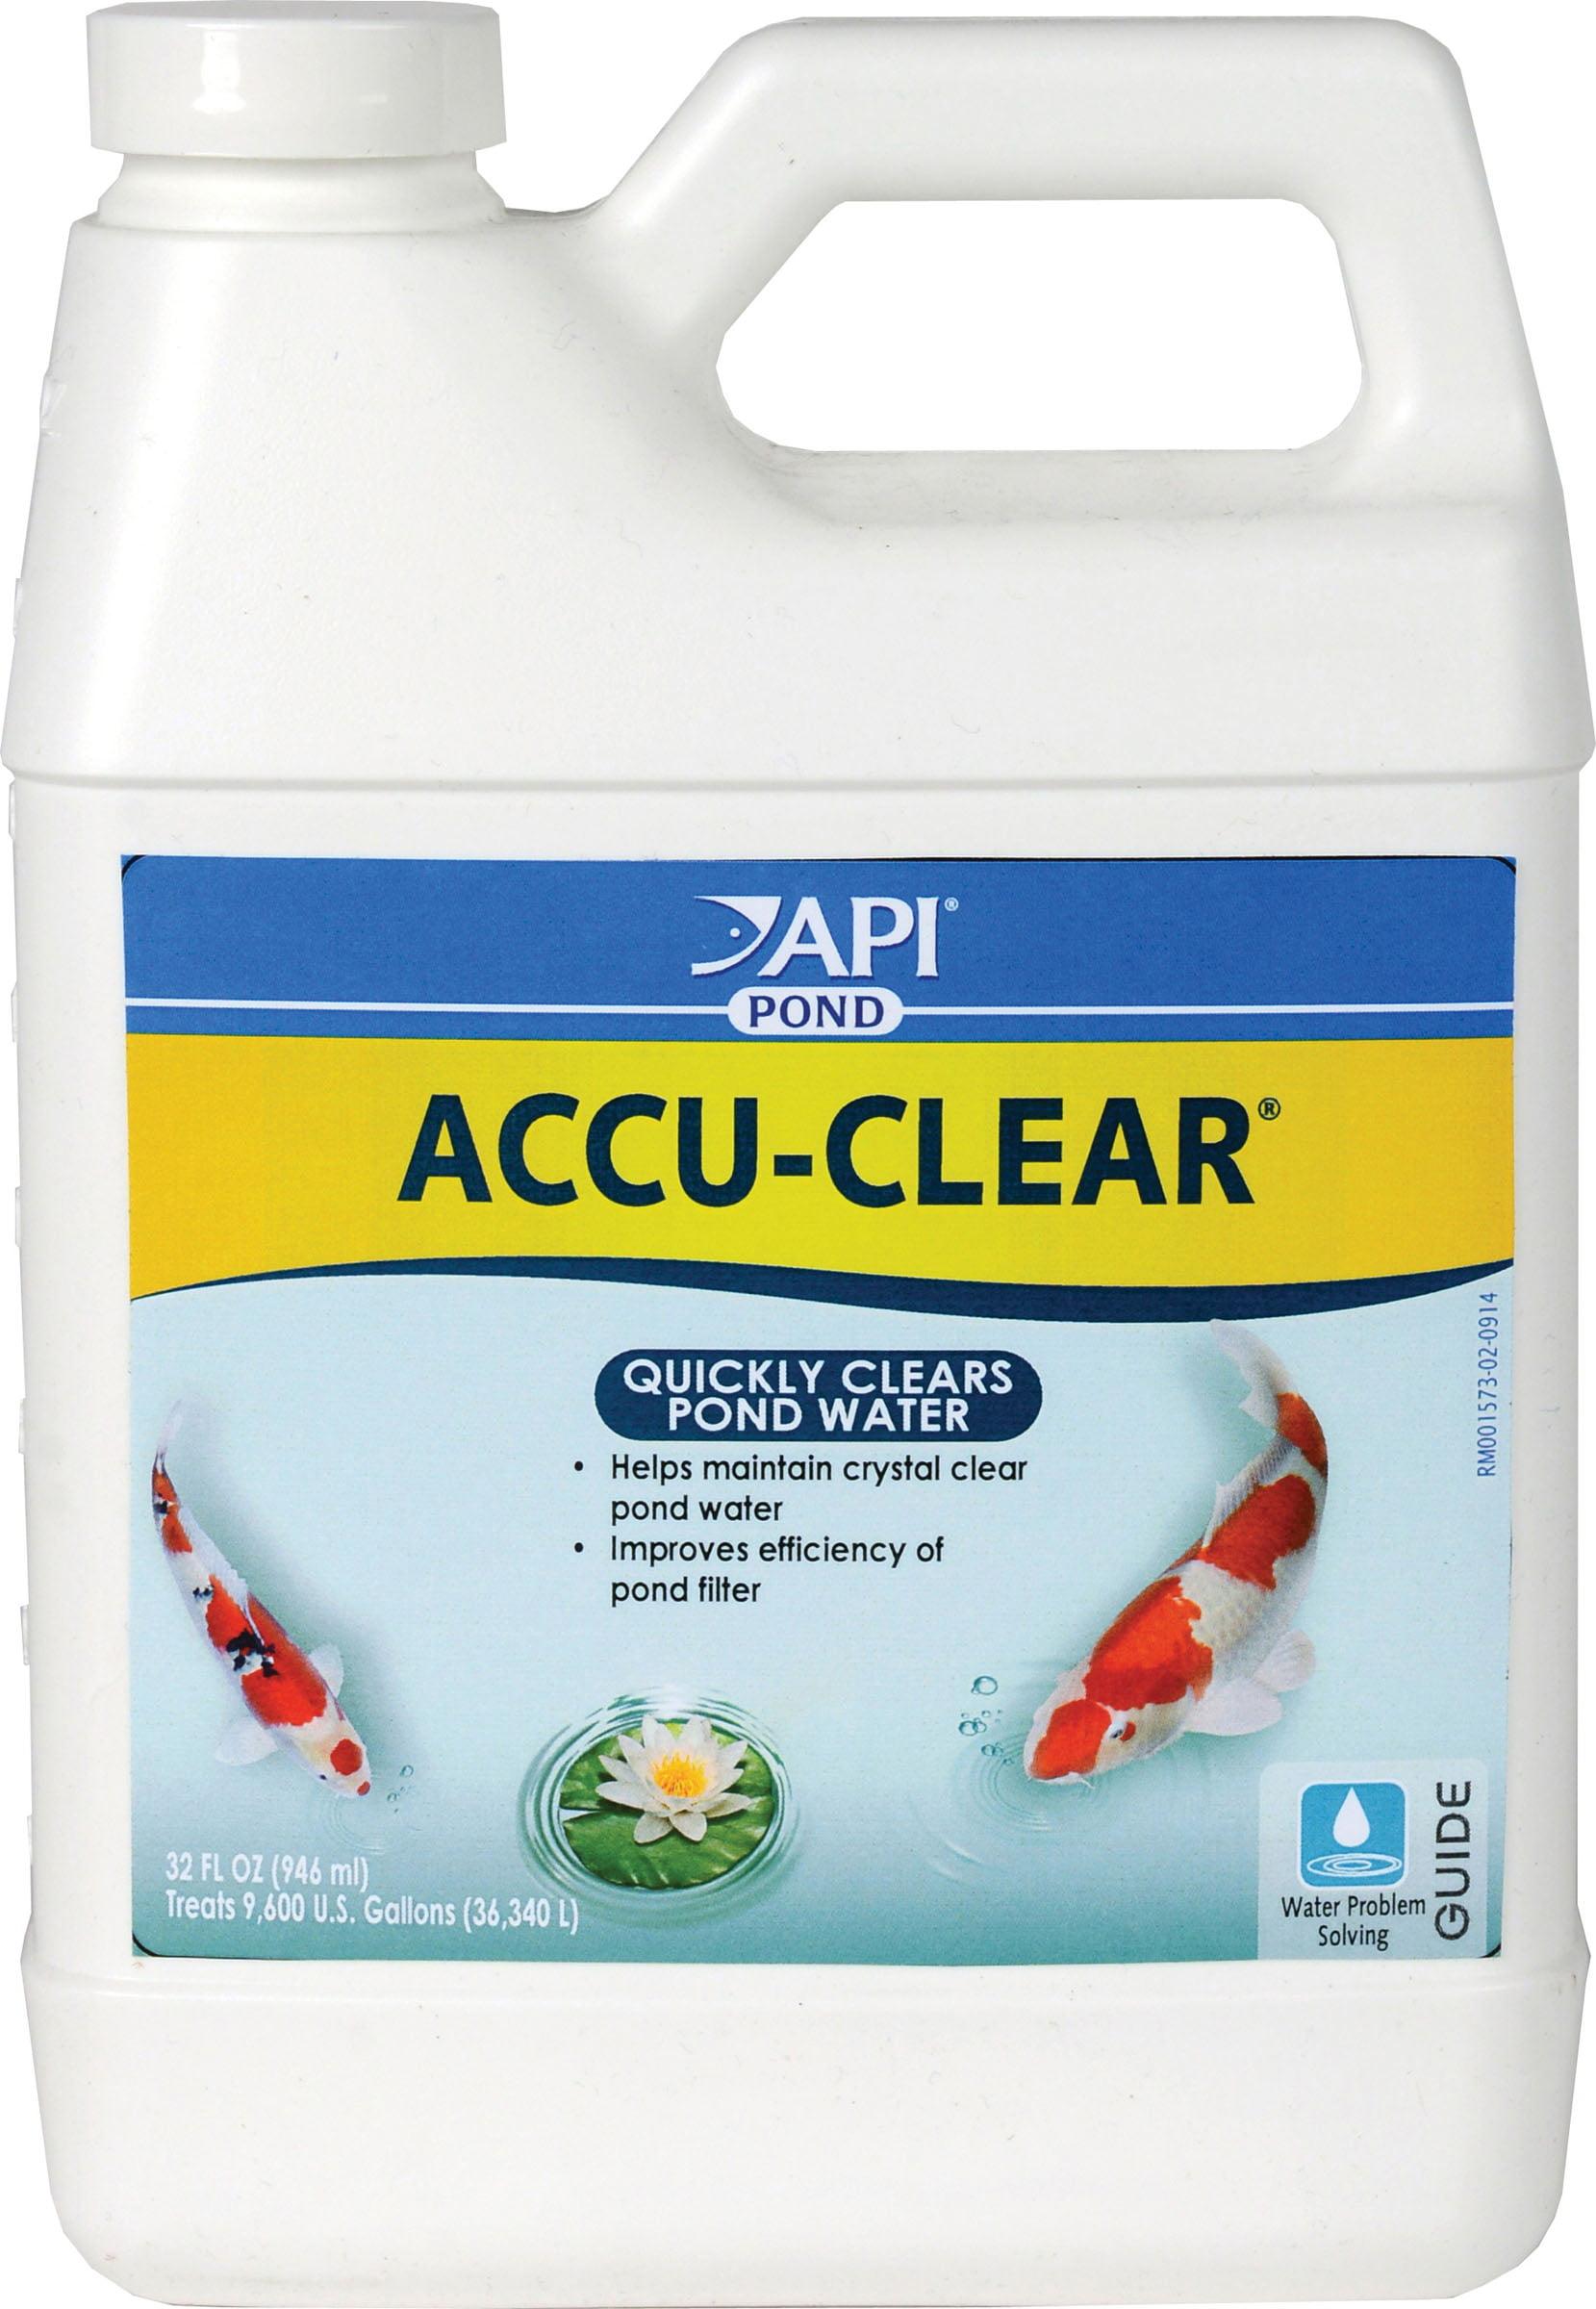 Pondcare 142G 32 Oz Accu-Clear Pond Clarifier by Mars Fishcare North America